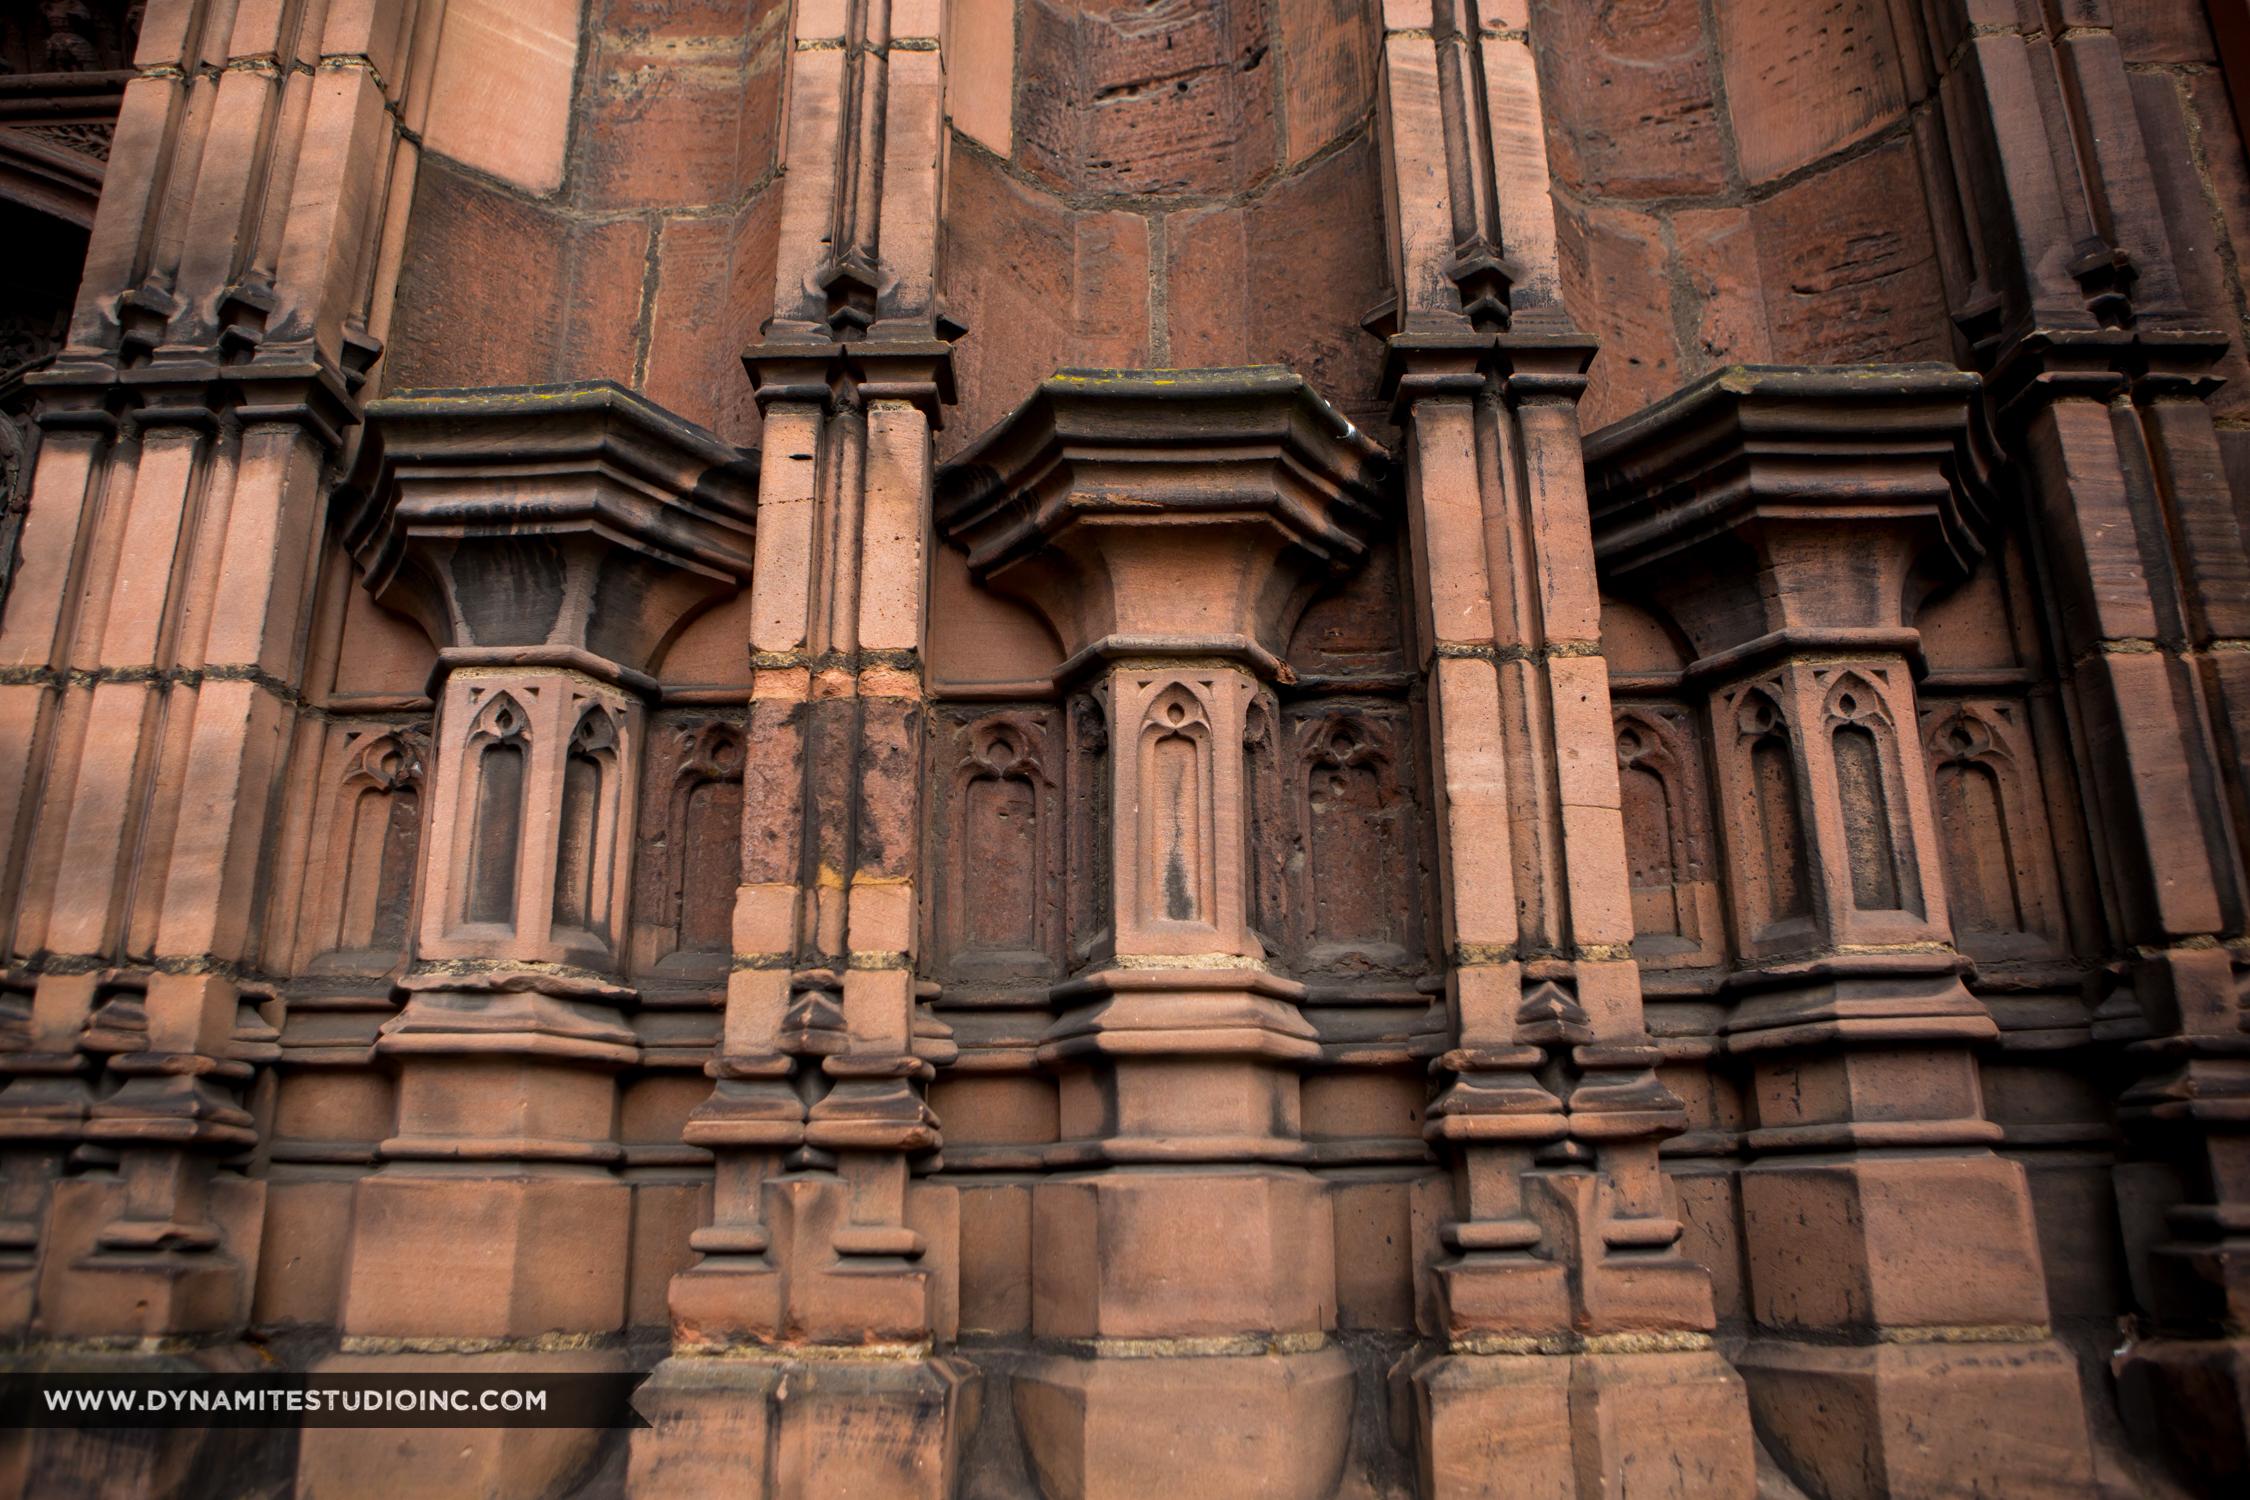 www.dynamitestudioinc.com-chester-england-travel-photography-orlando-17.jpg